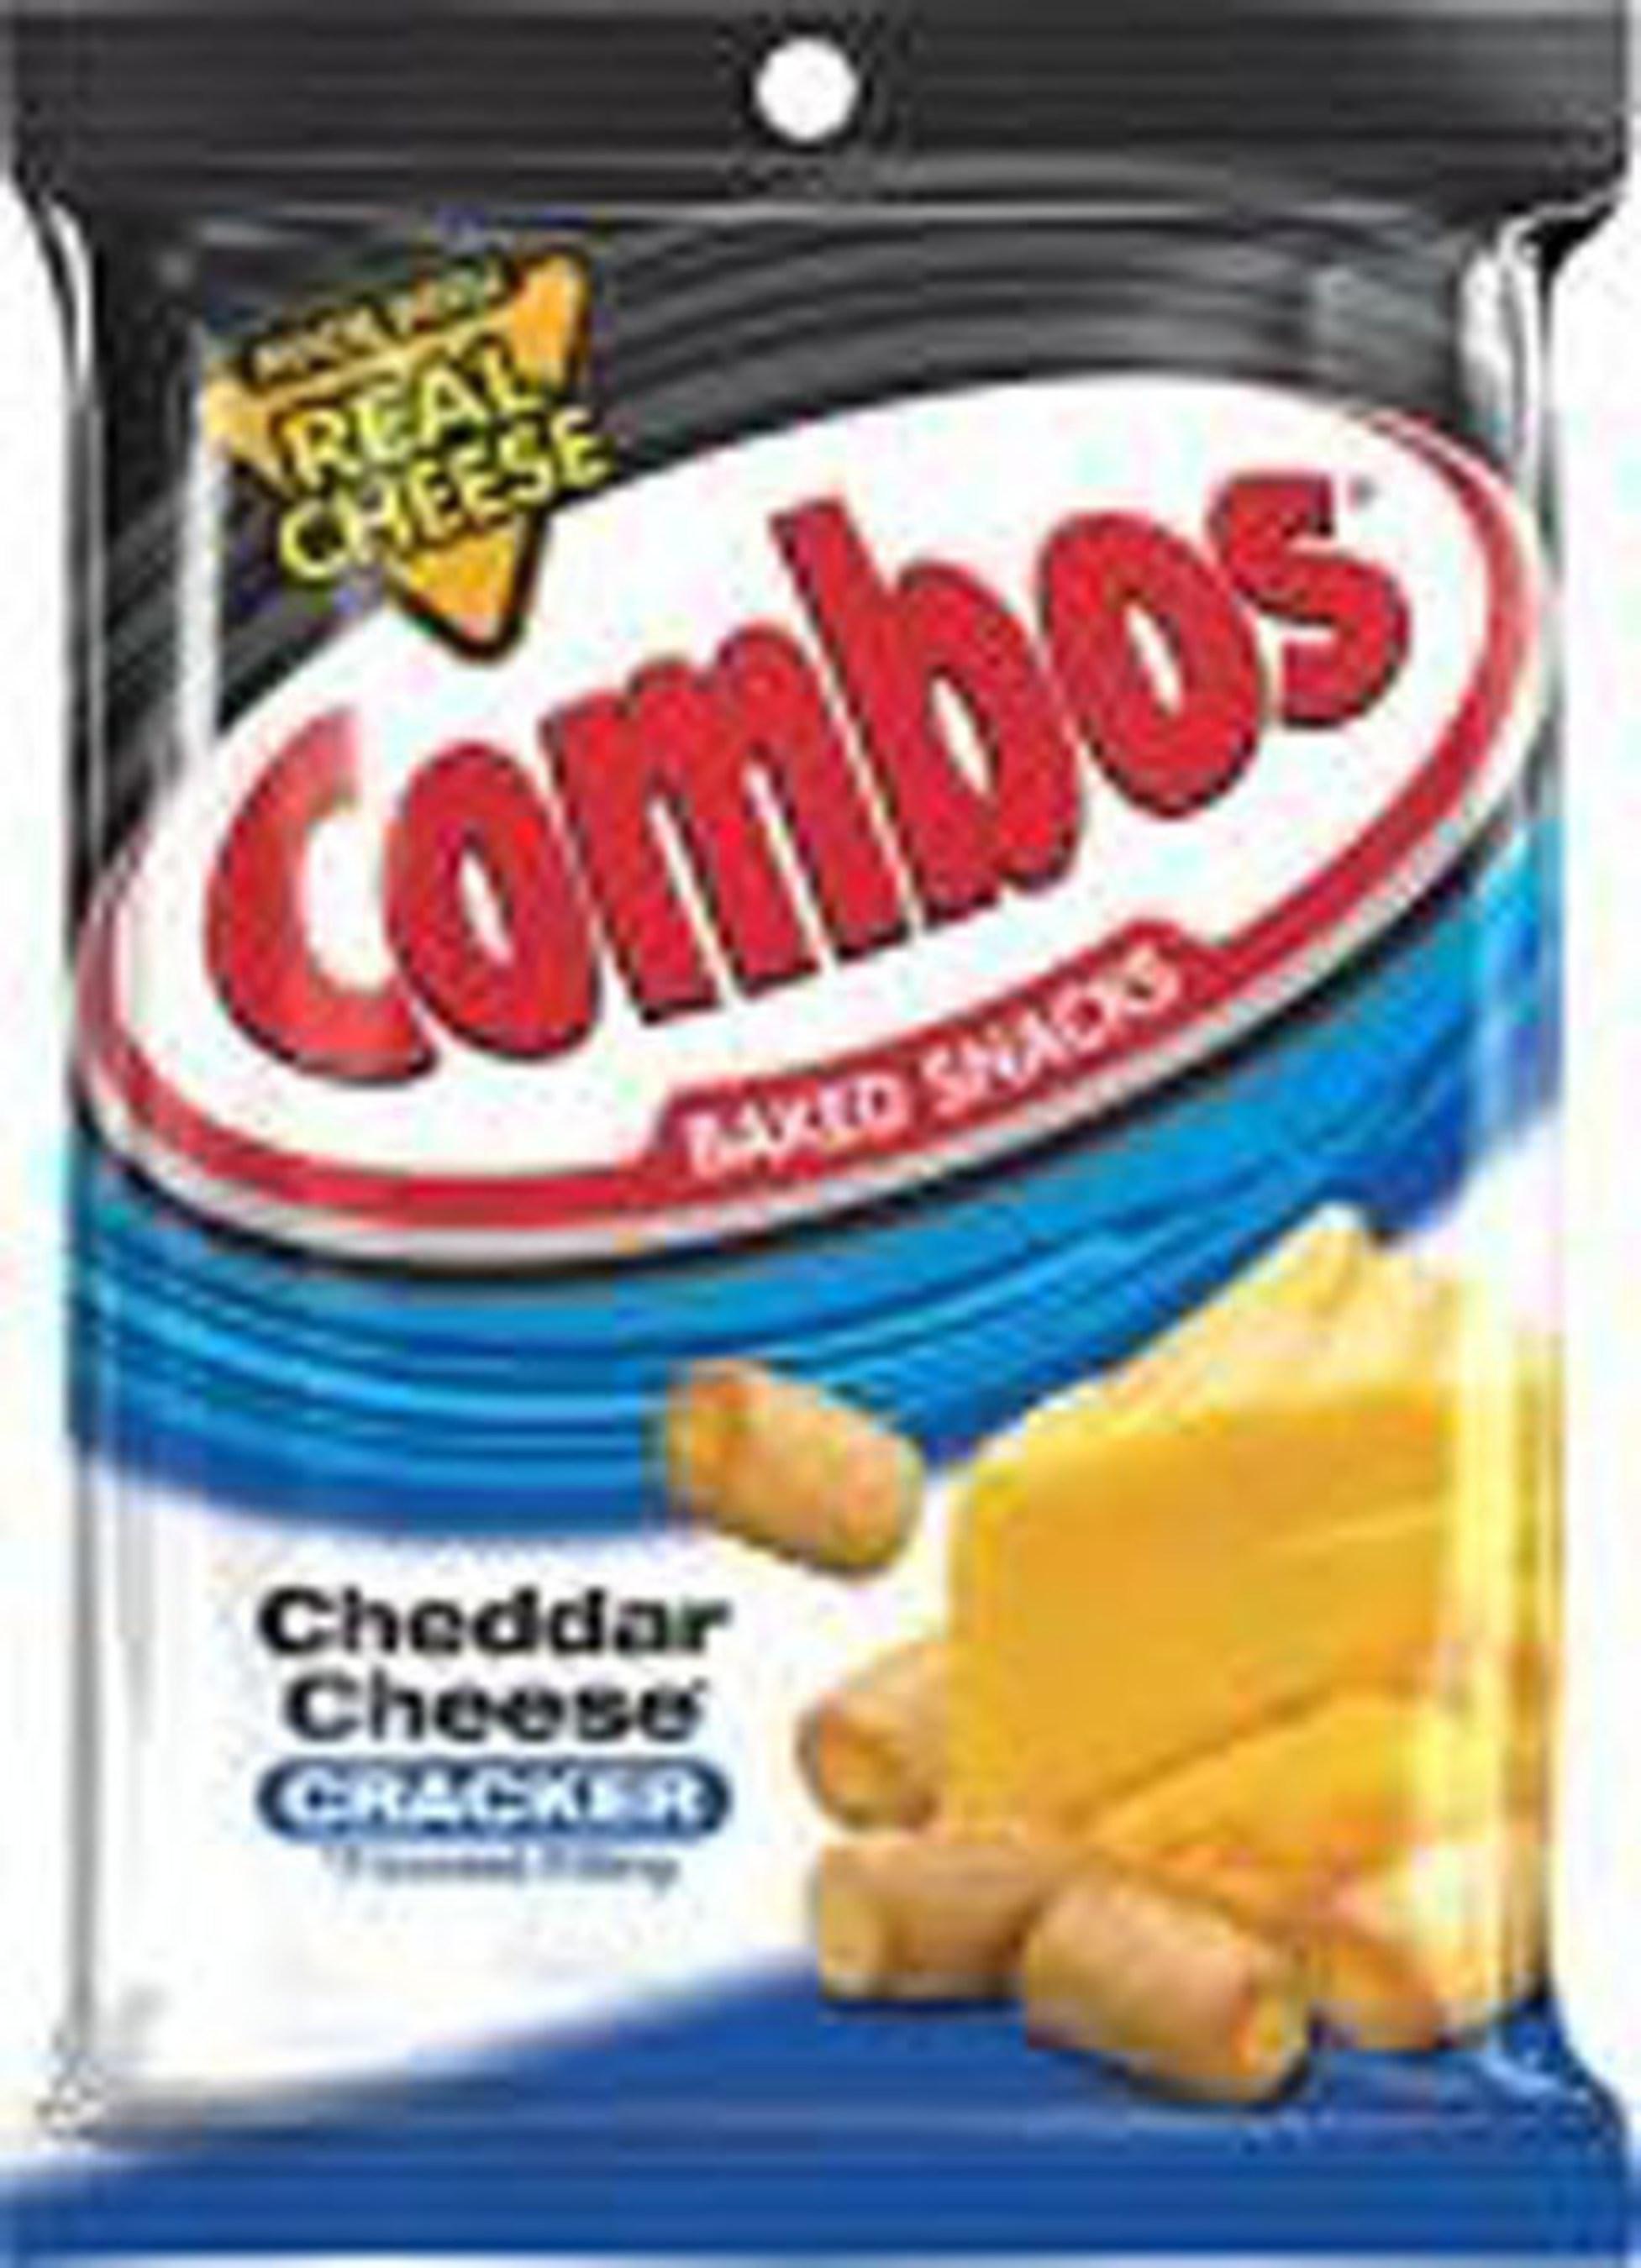 COMBOS SNACKS CHEDDAR CHEESE CRACKER - 15 OZ - 8/CA